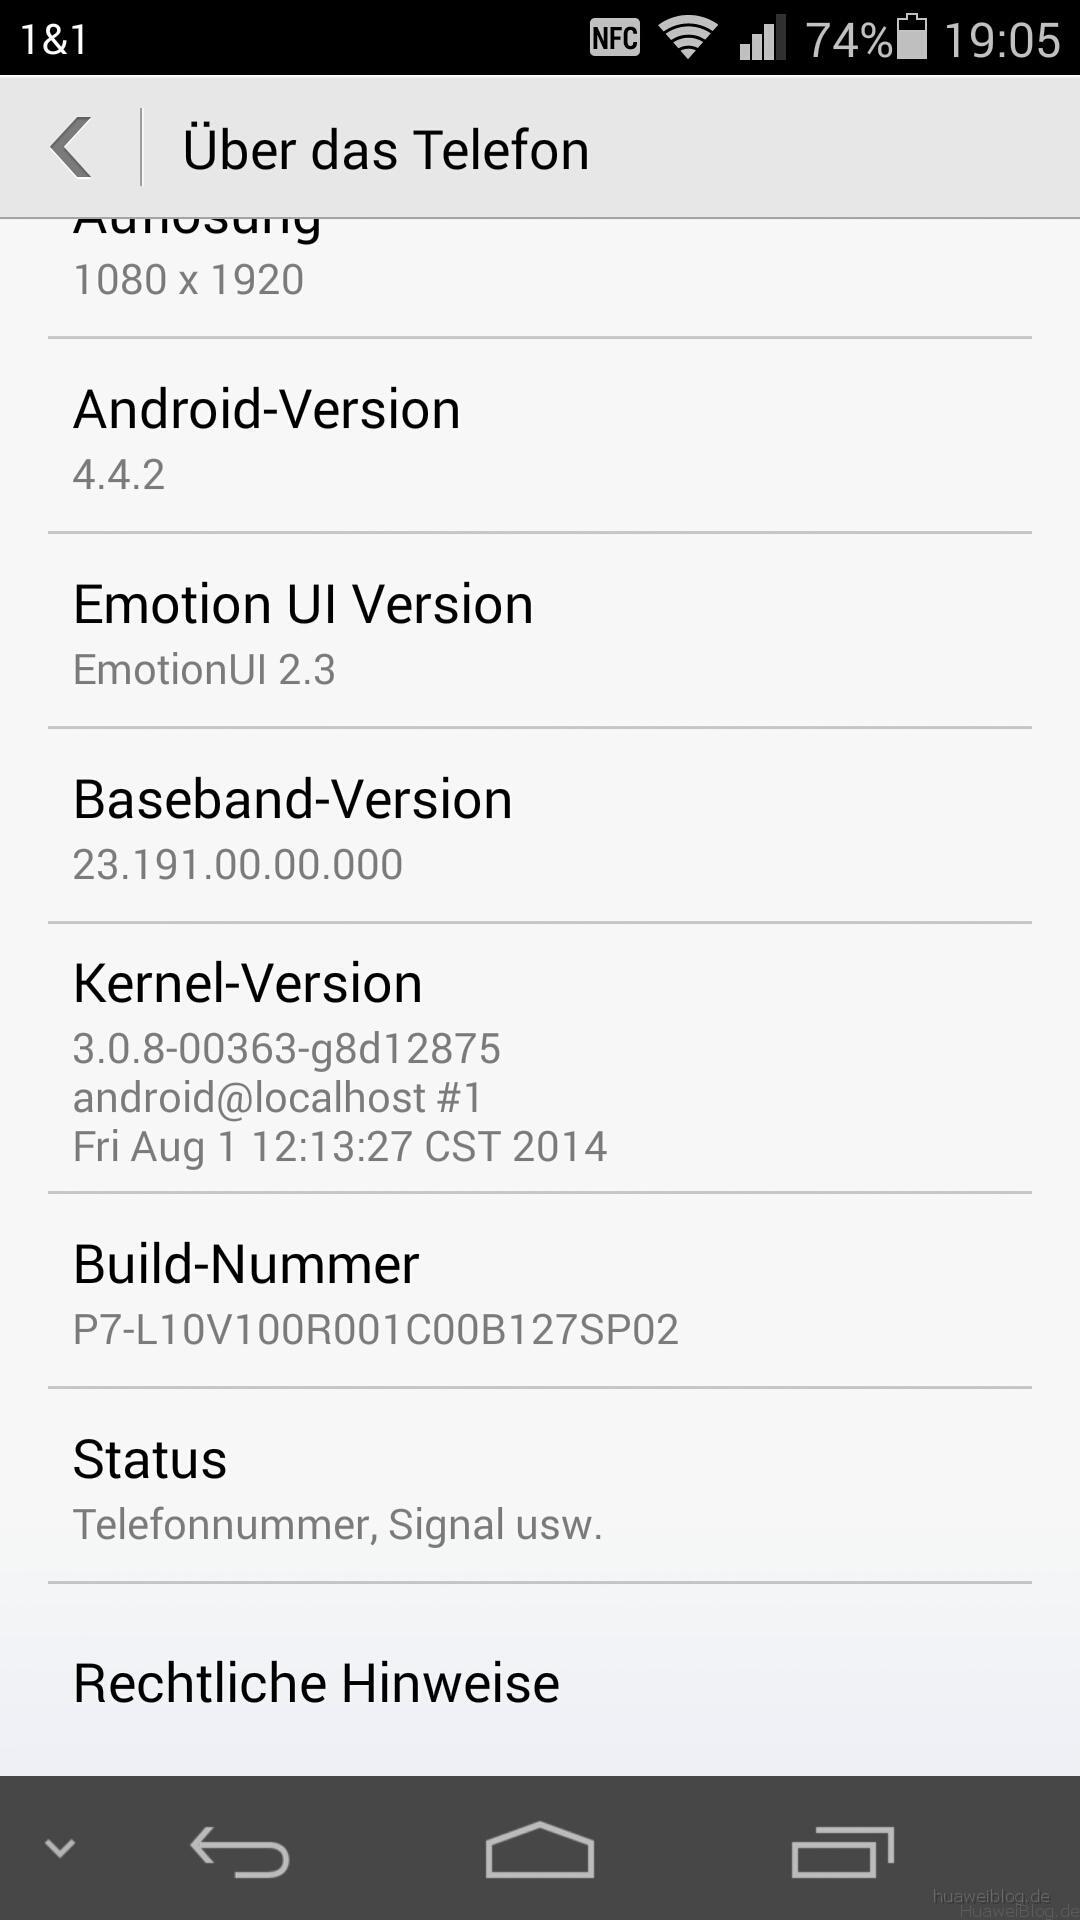 Huawei Ascend P7 Firmware B127SP02